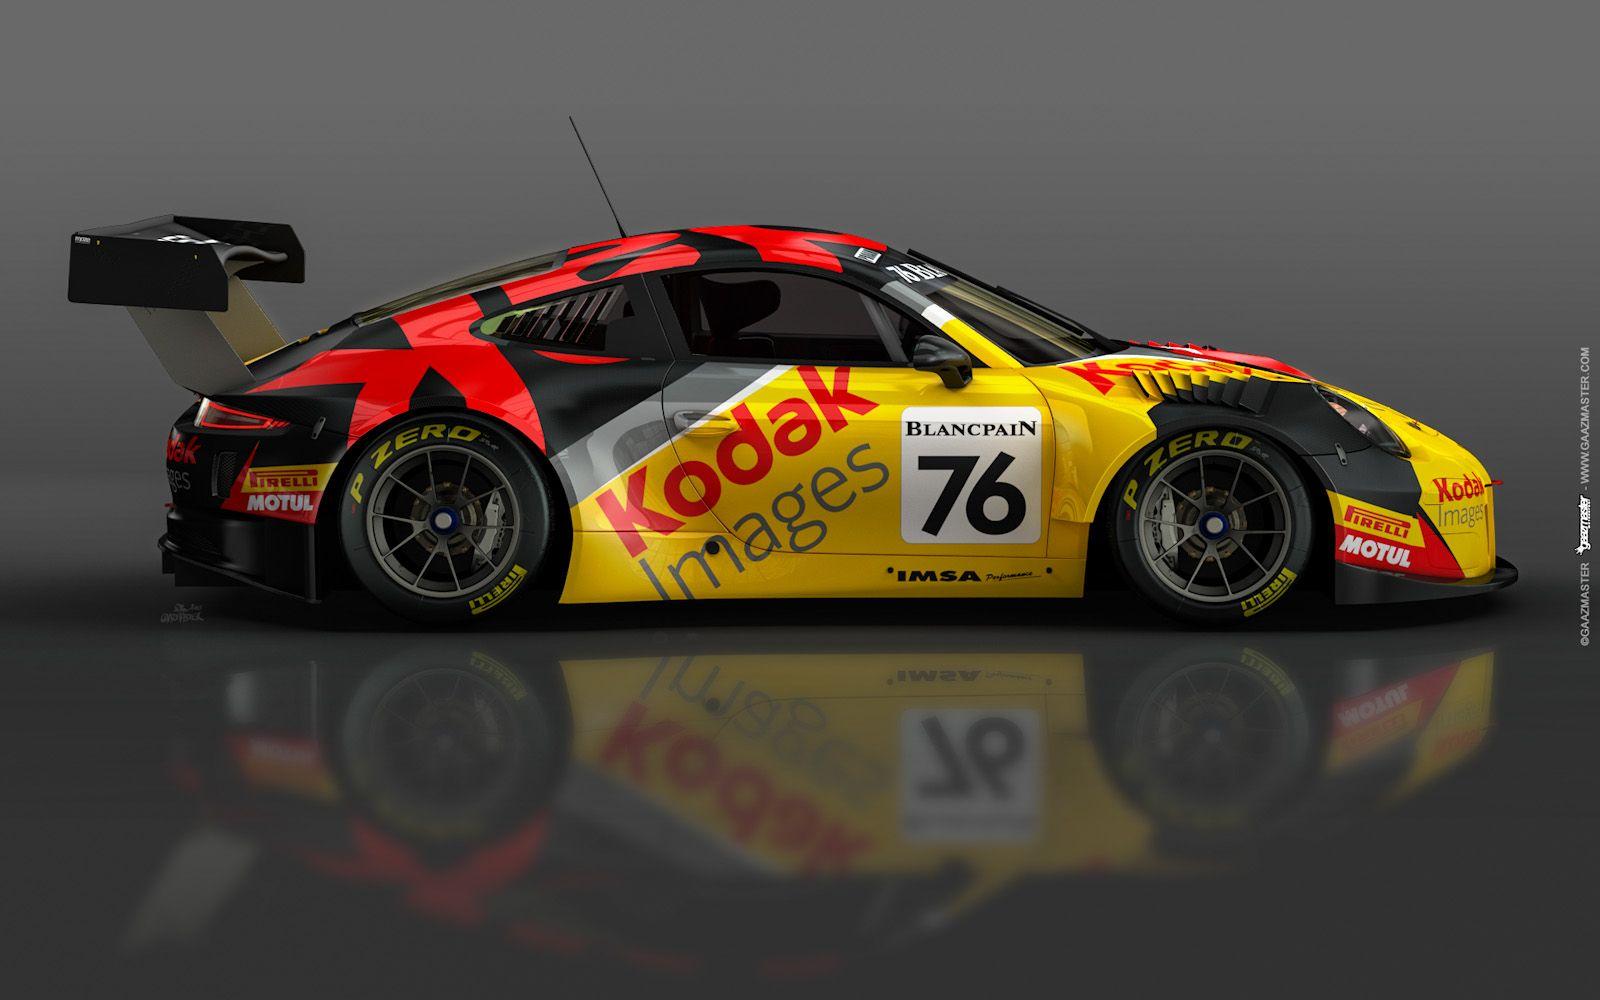 GaazMaster MotorSport - Porsche GT3R – IMSA Performance – Kodak